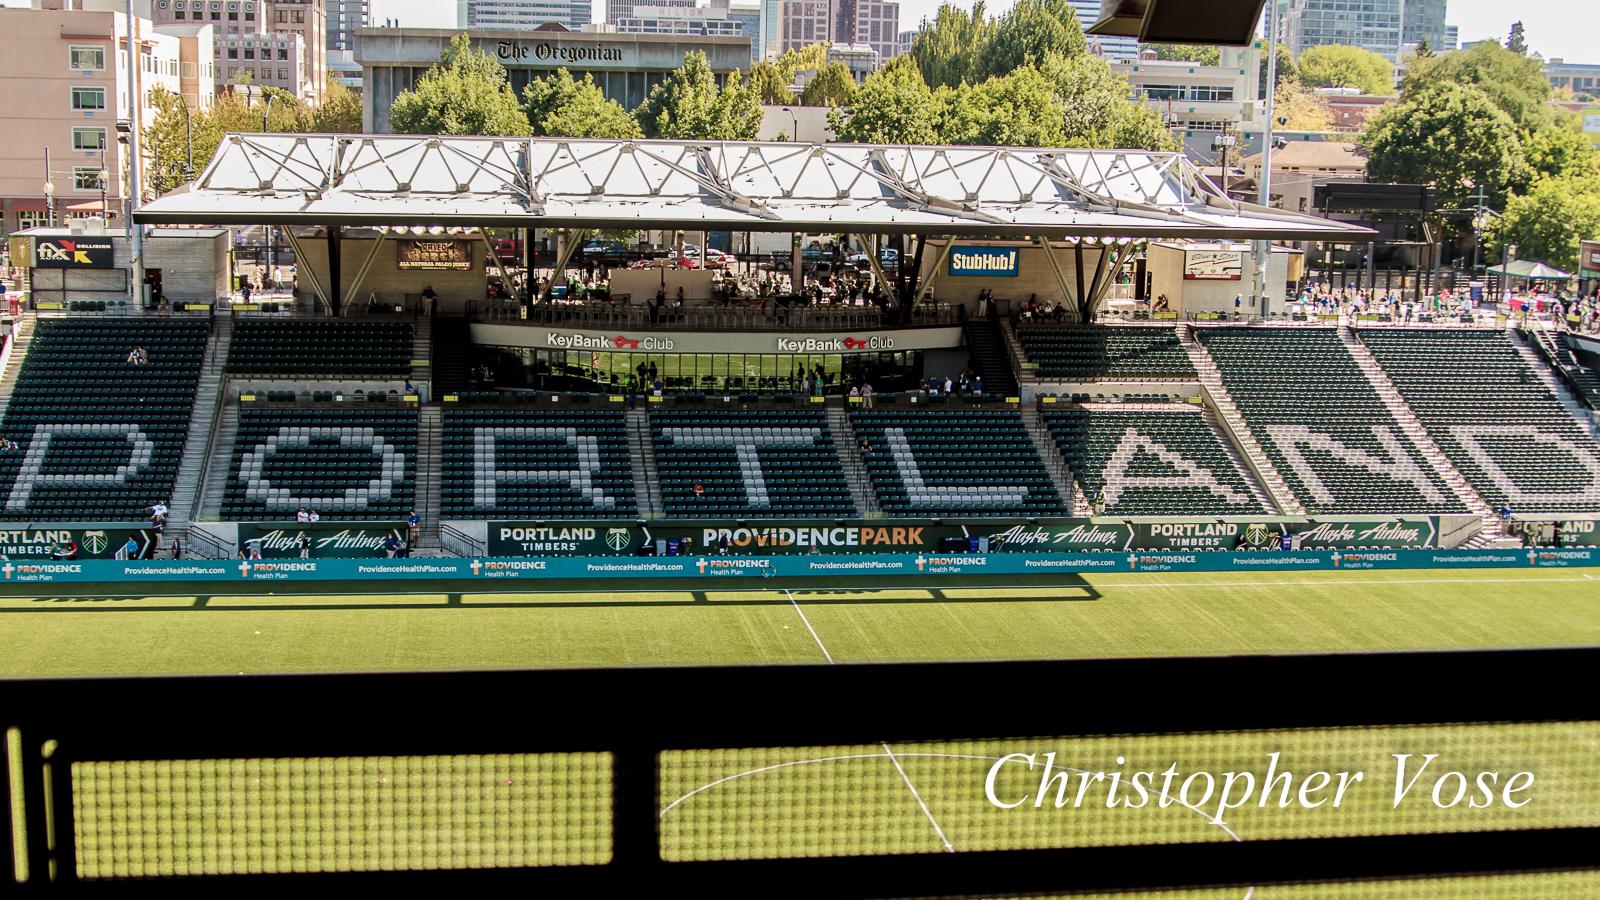 2014-09-20 Civic Stadium.jpg